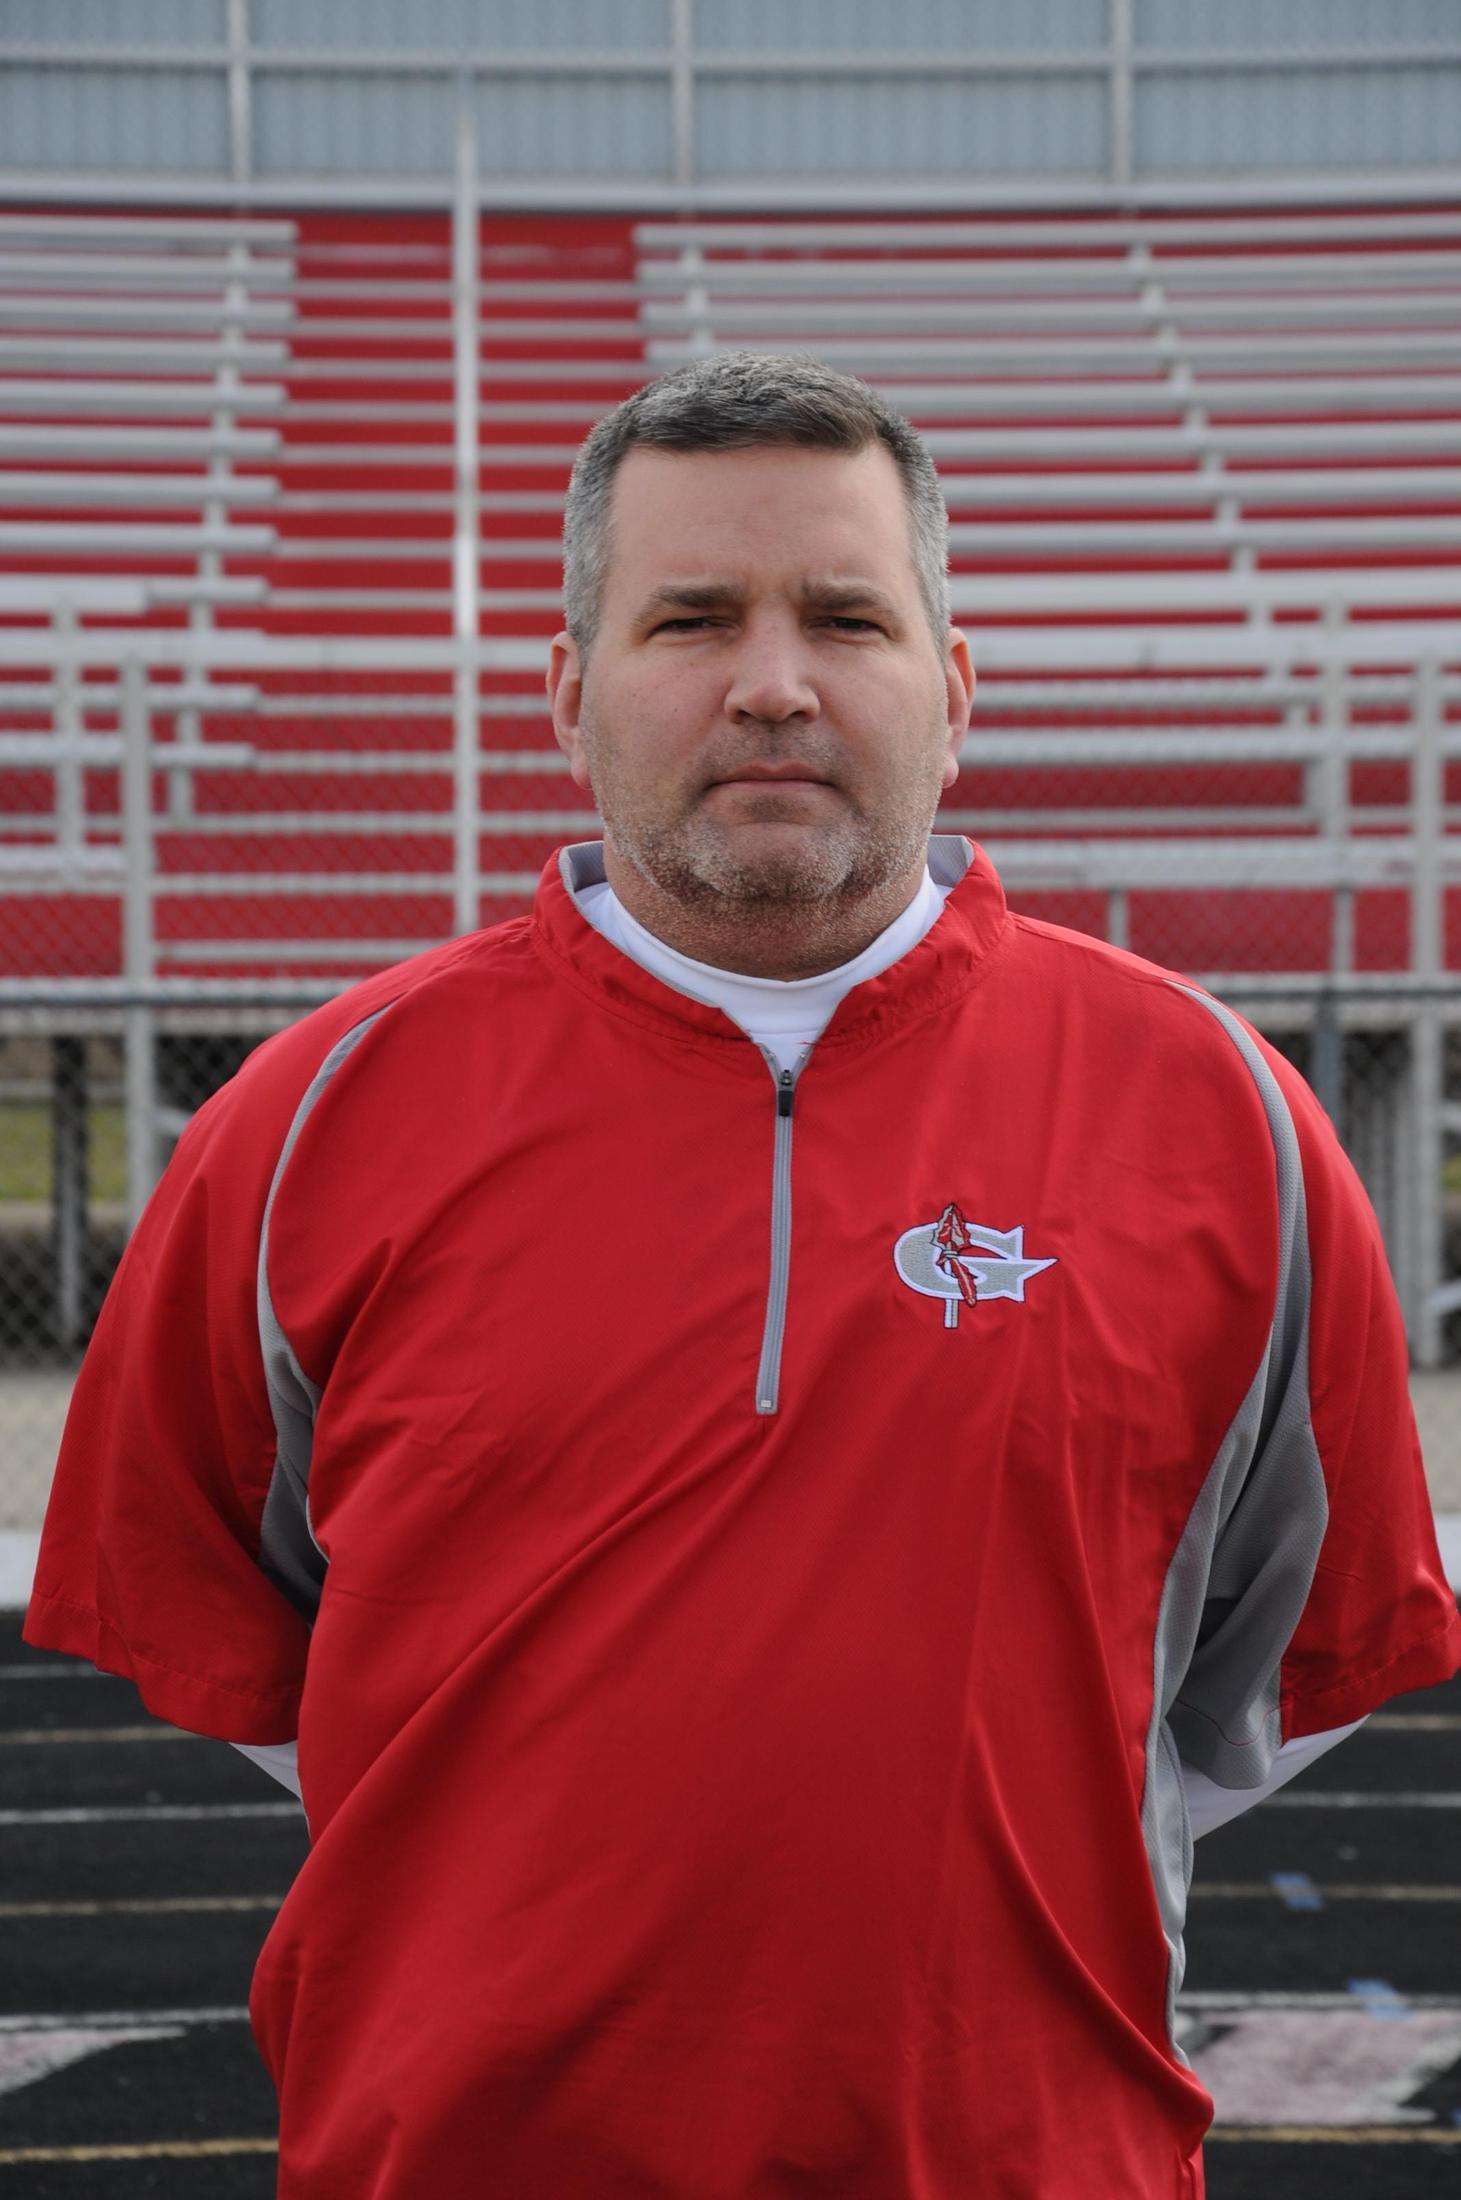 JV Coach Sheldon